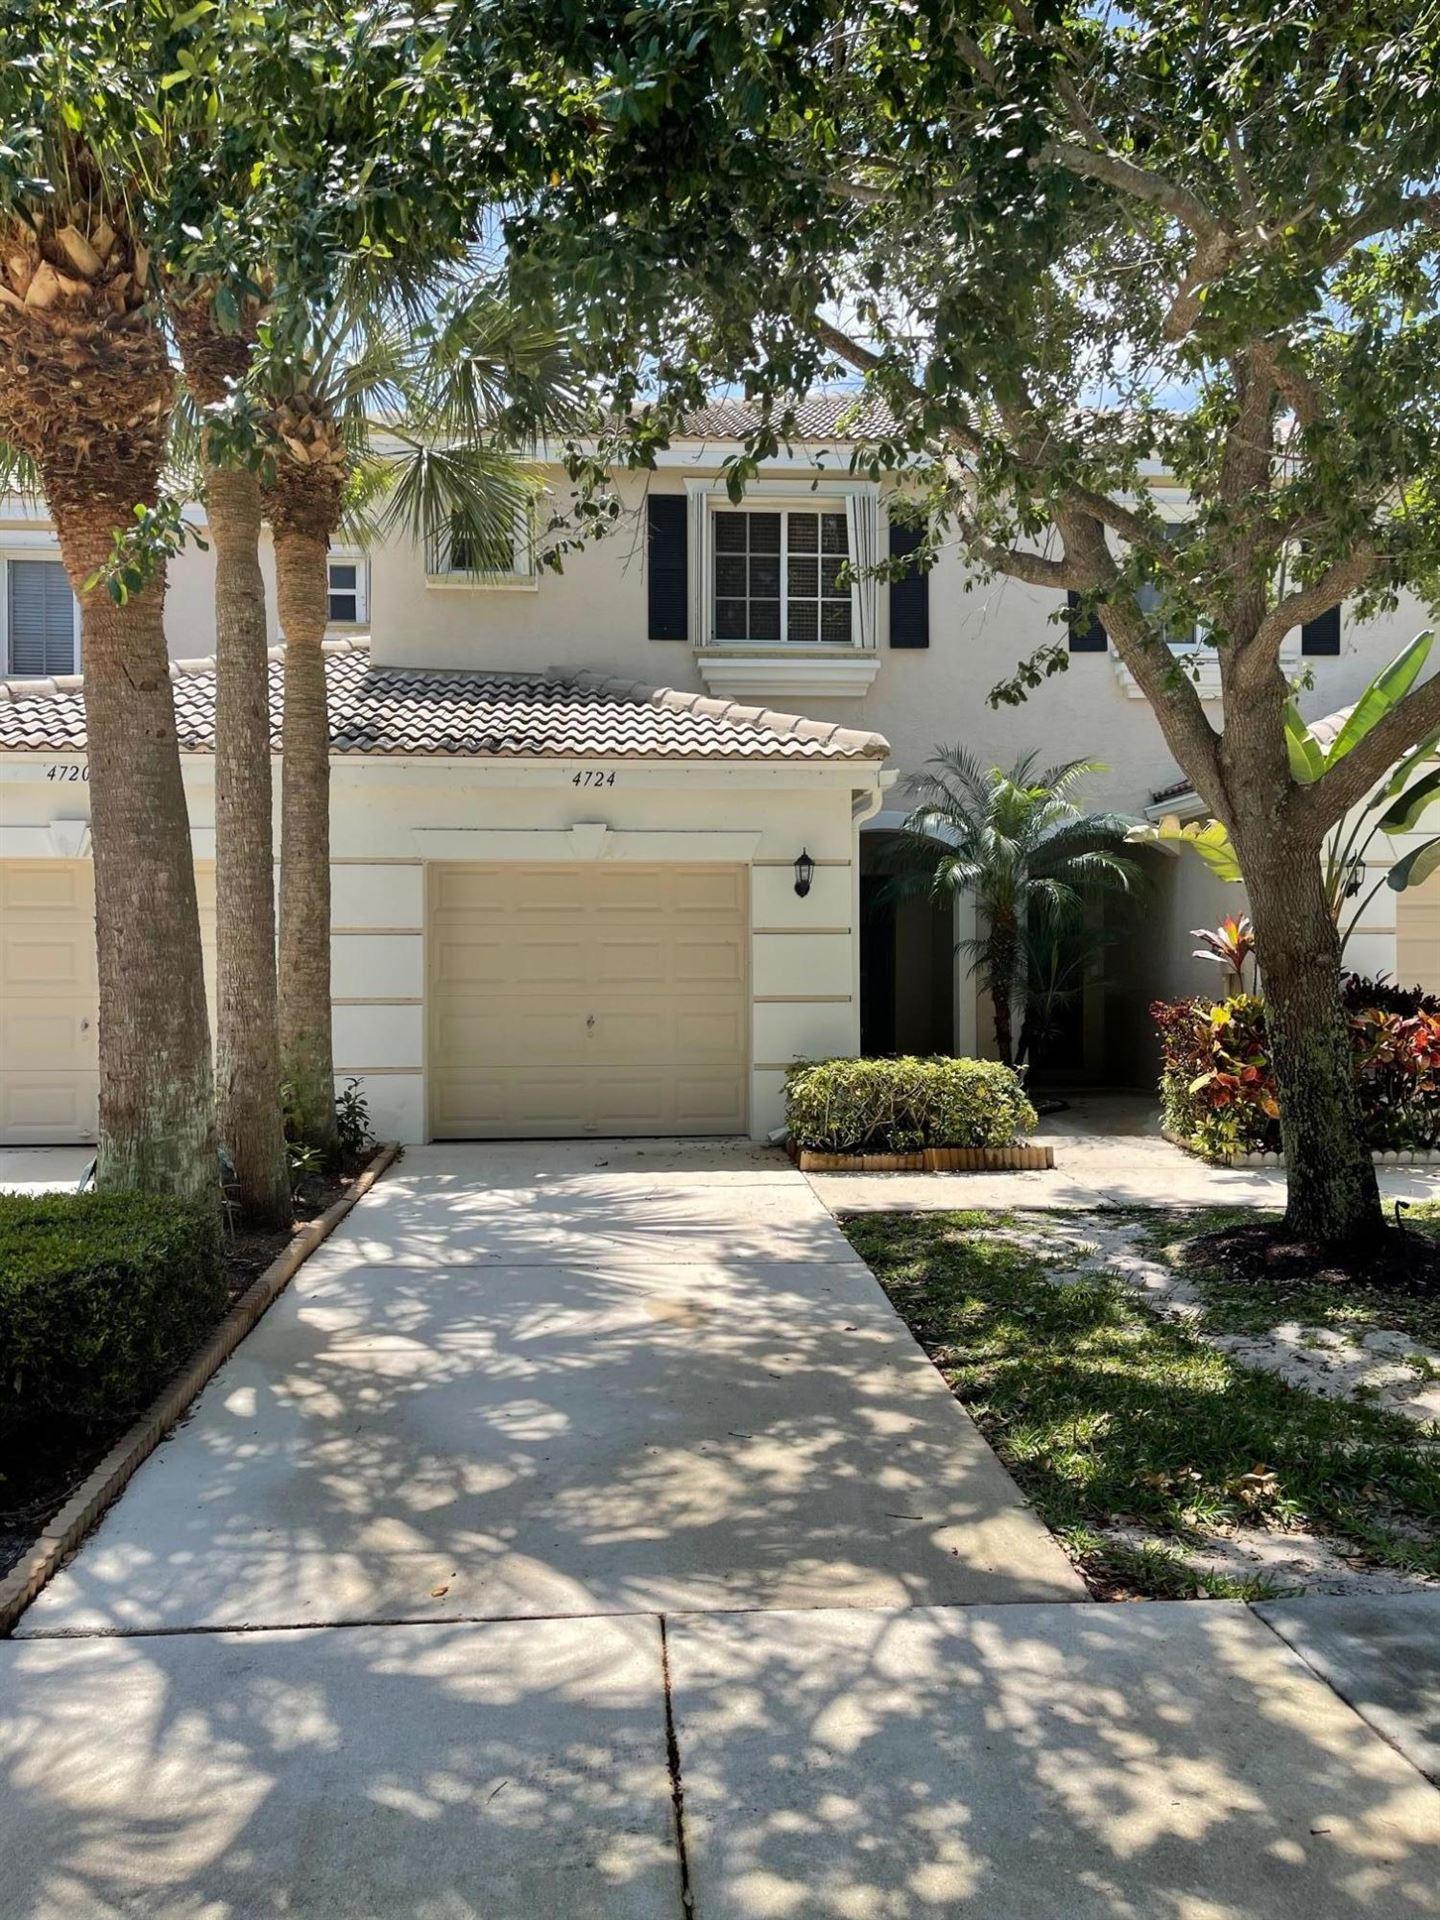 4724 Palmbrooke Circle, West Palm Beach, FL 33417 - MLS#: RX-10713414